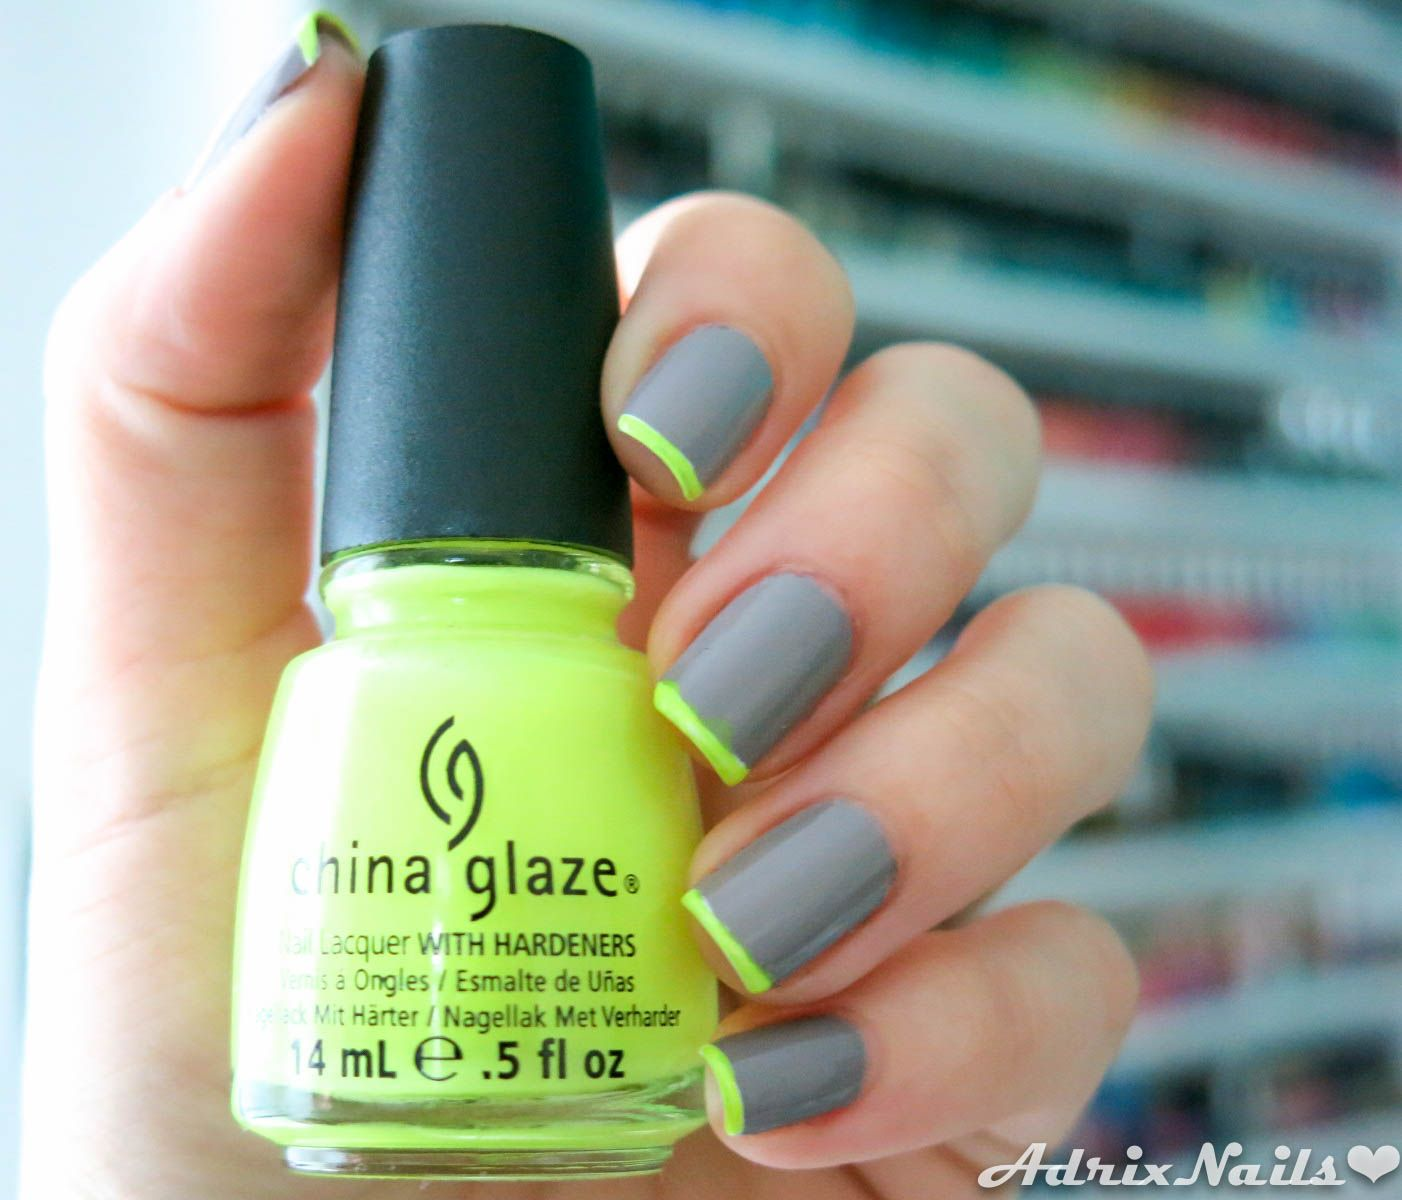 Gris y neón #nails #nailart #neon | Nails | Pinterest | Neón, Dias ...